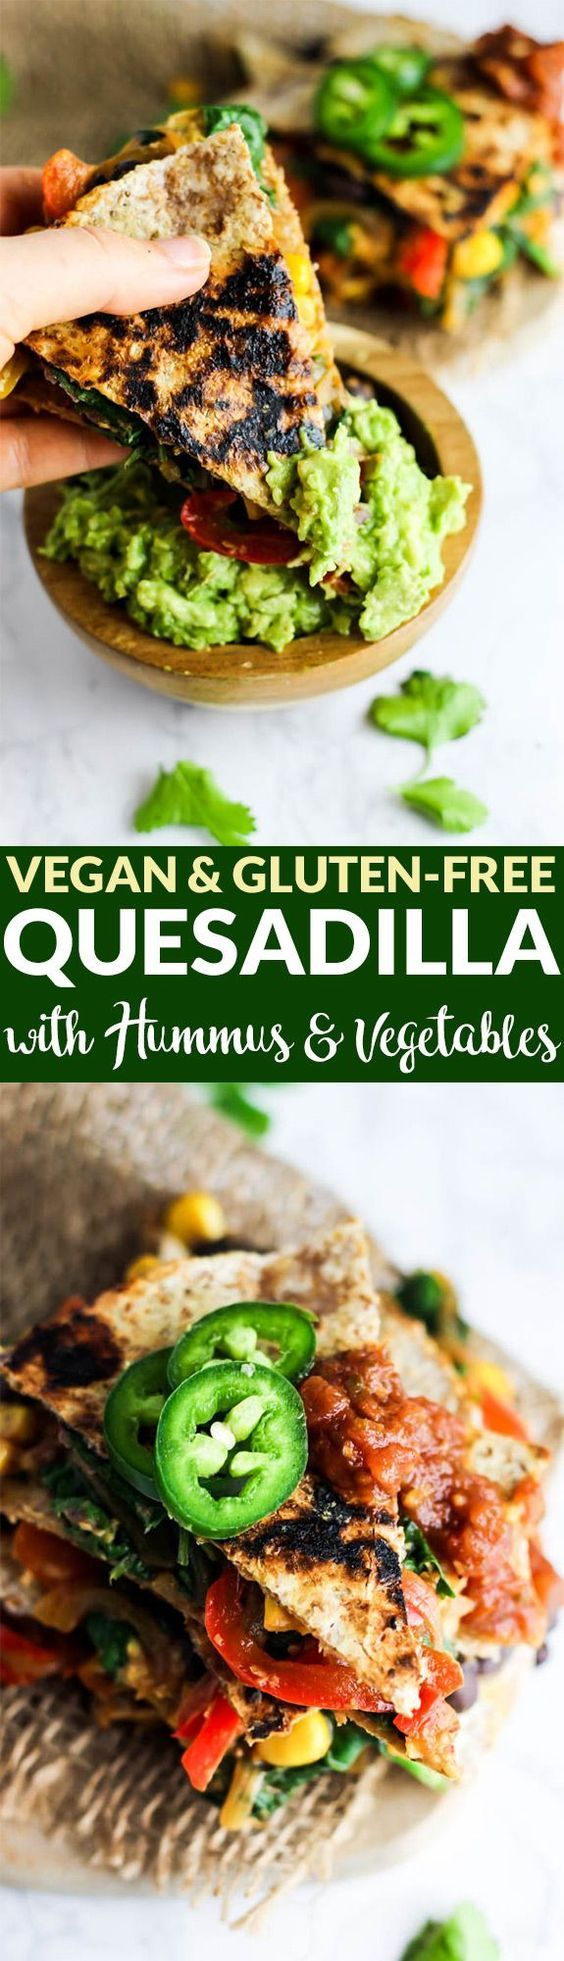 cool Vegan Quesadilla with Hummus & Vegetables